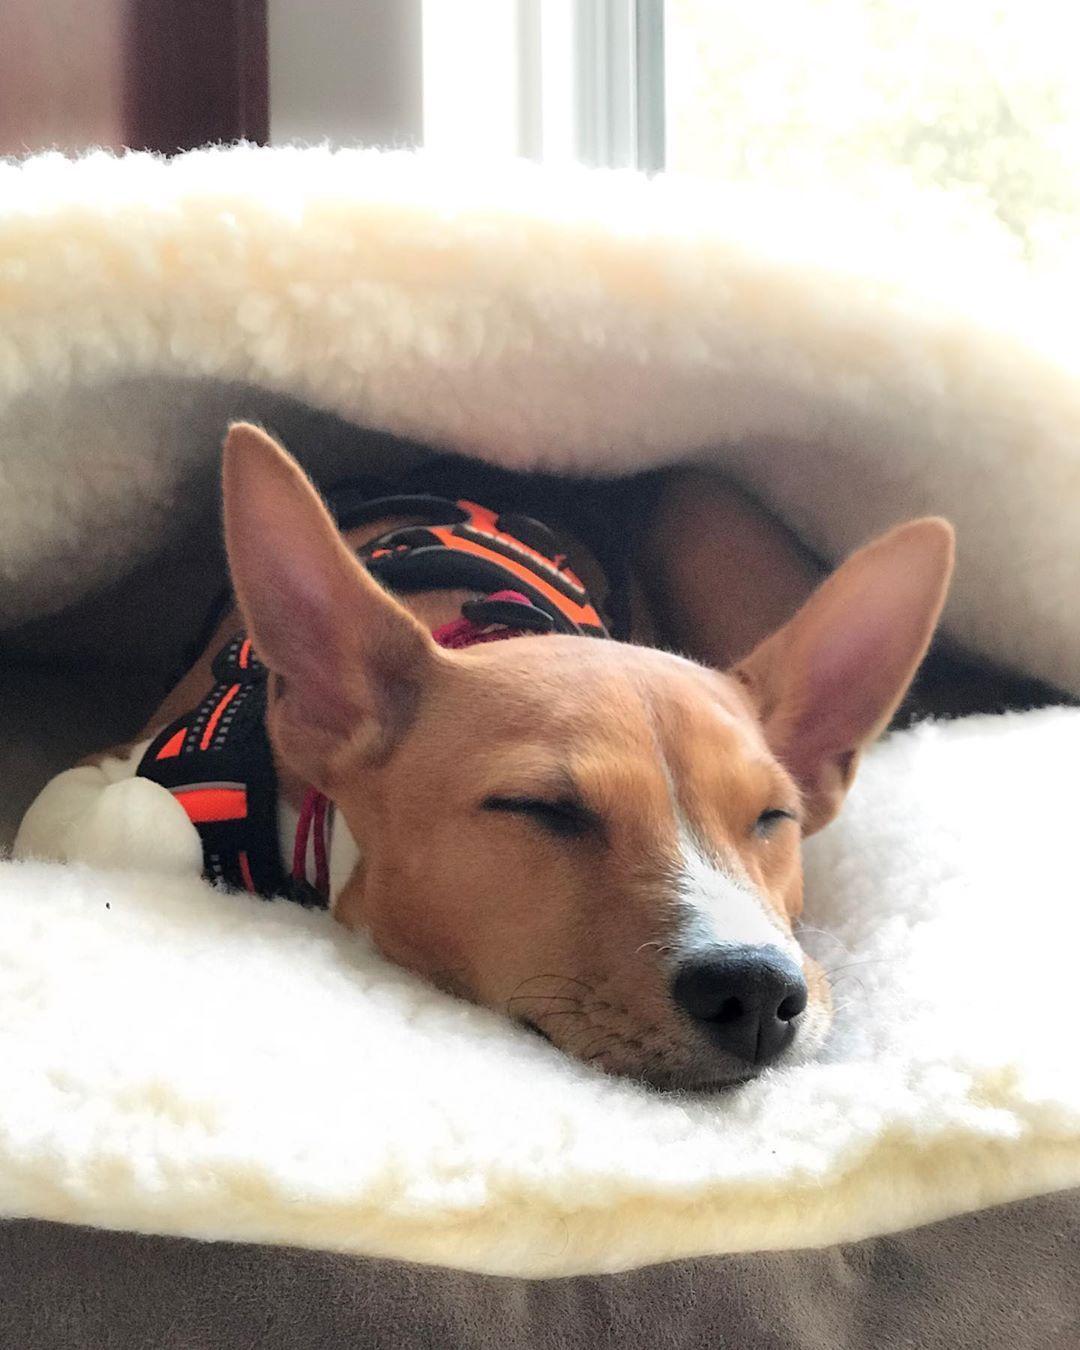 Saturday morning mood with teddy_the_basenji sleep